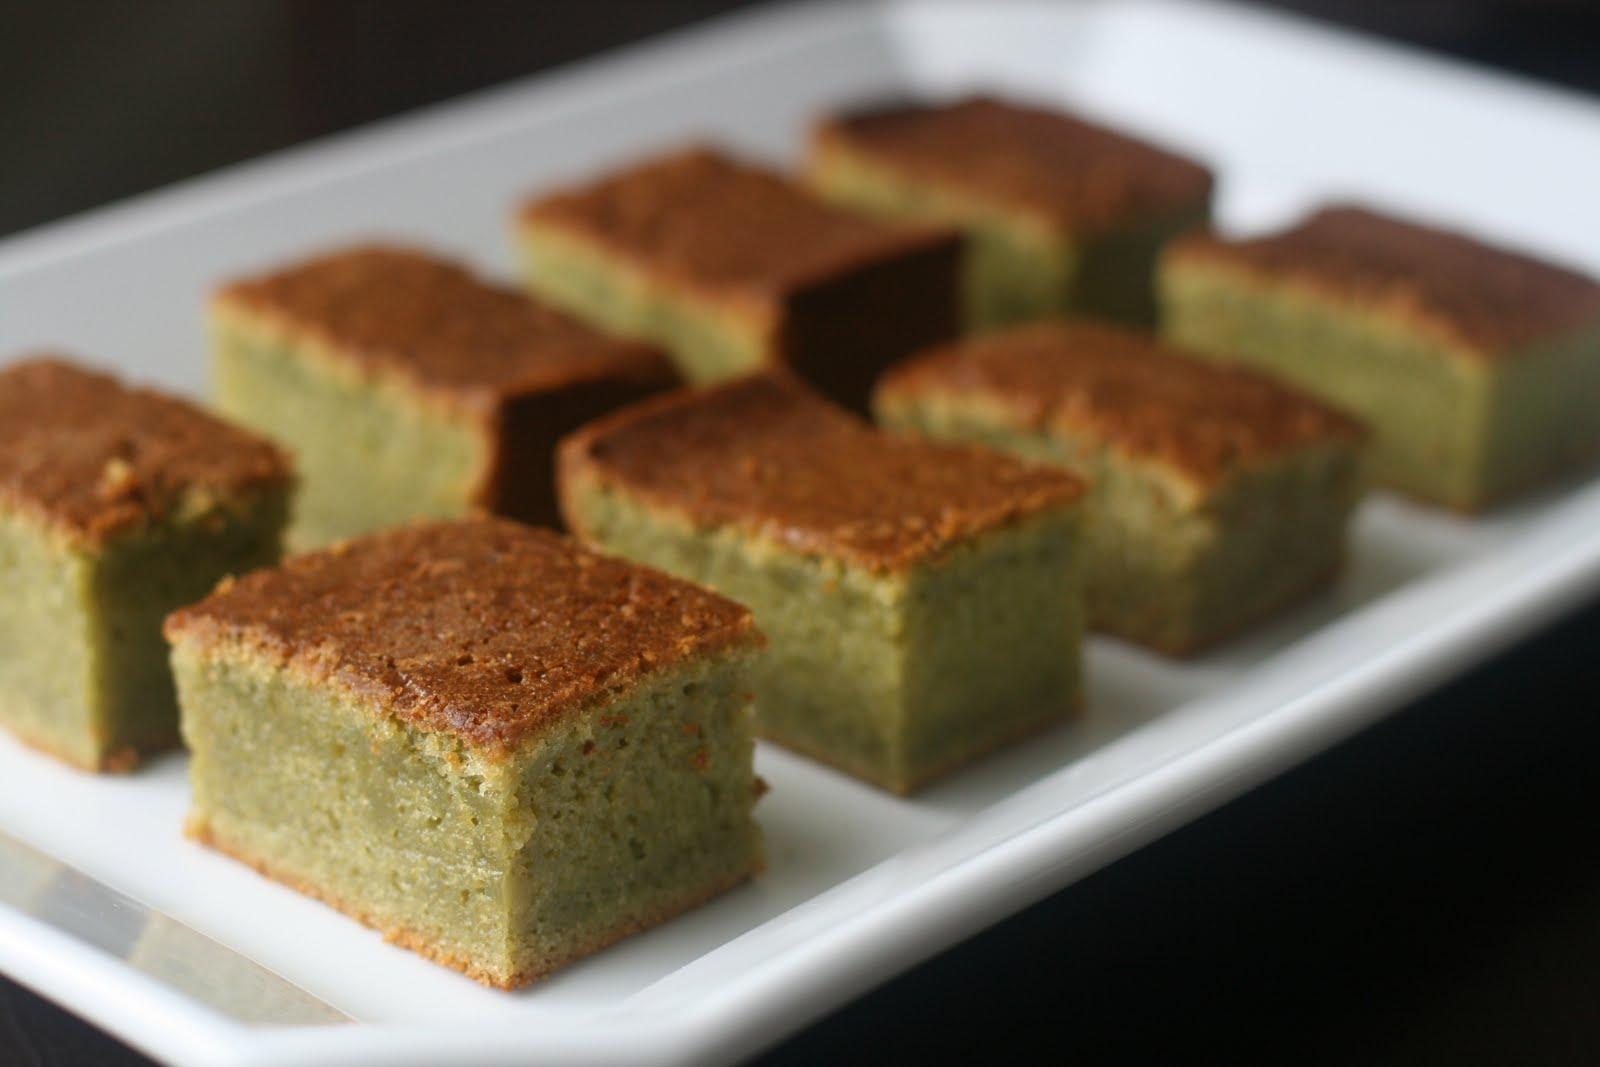 Butter Cake Recipe Japanese: Week Of Menus: Green Tea Mochi Cake: Living With Regret